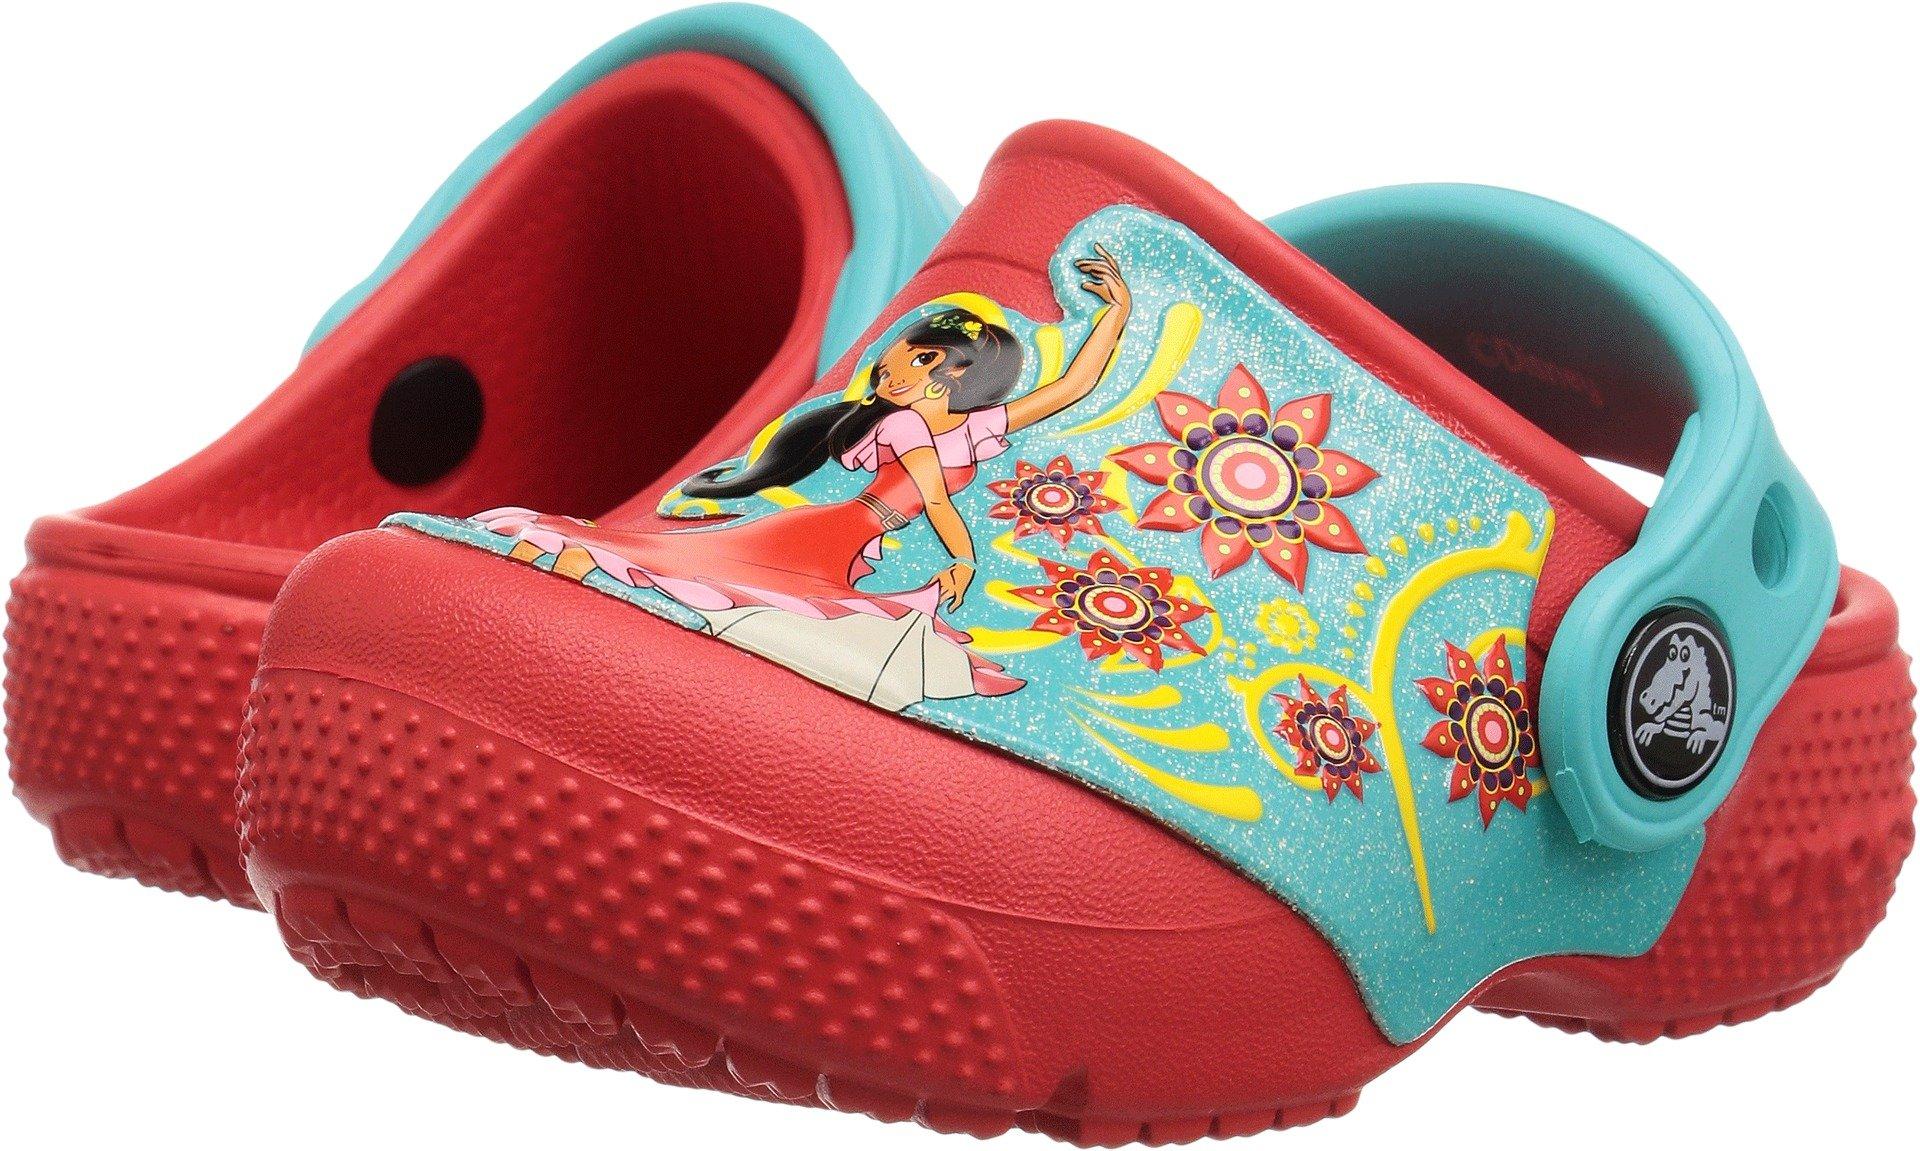 Crocs Girls' Crocsfunlab Elena of Avalor Clog, Flame, 4 M US Toddler